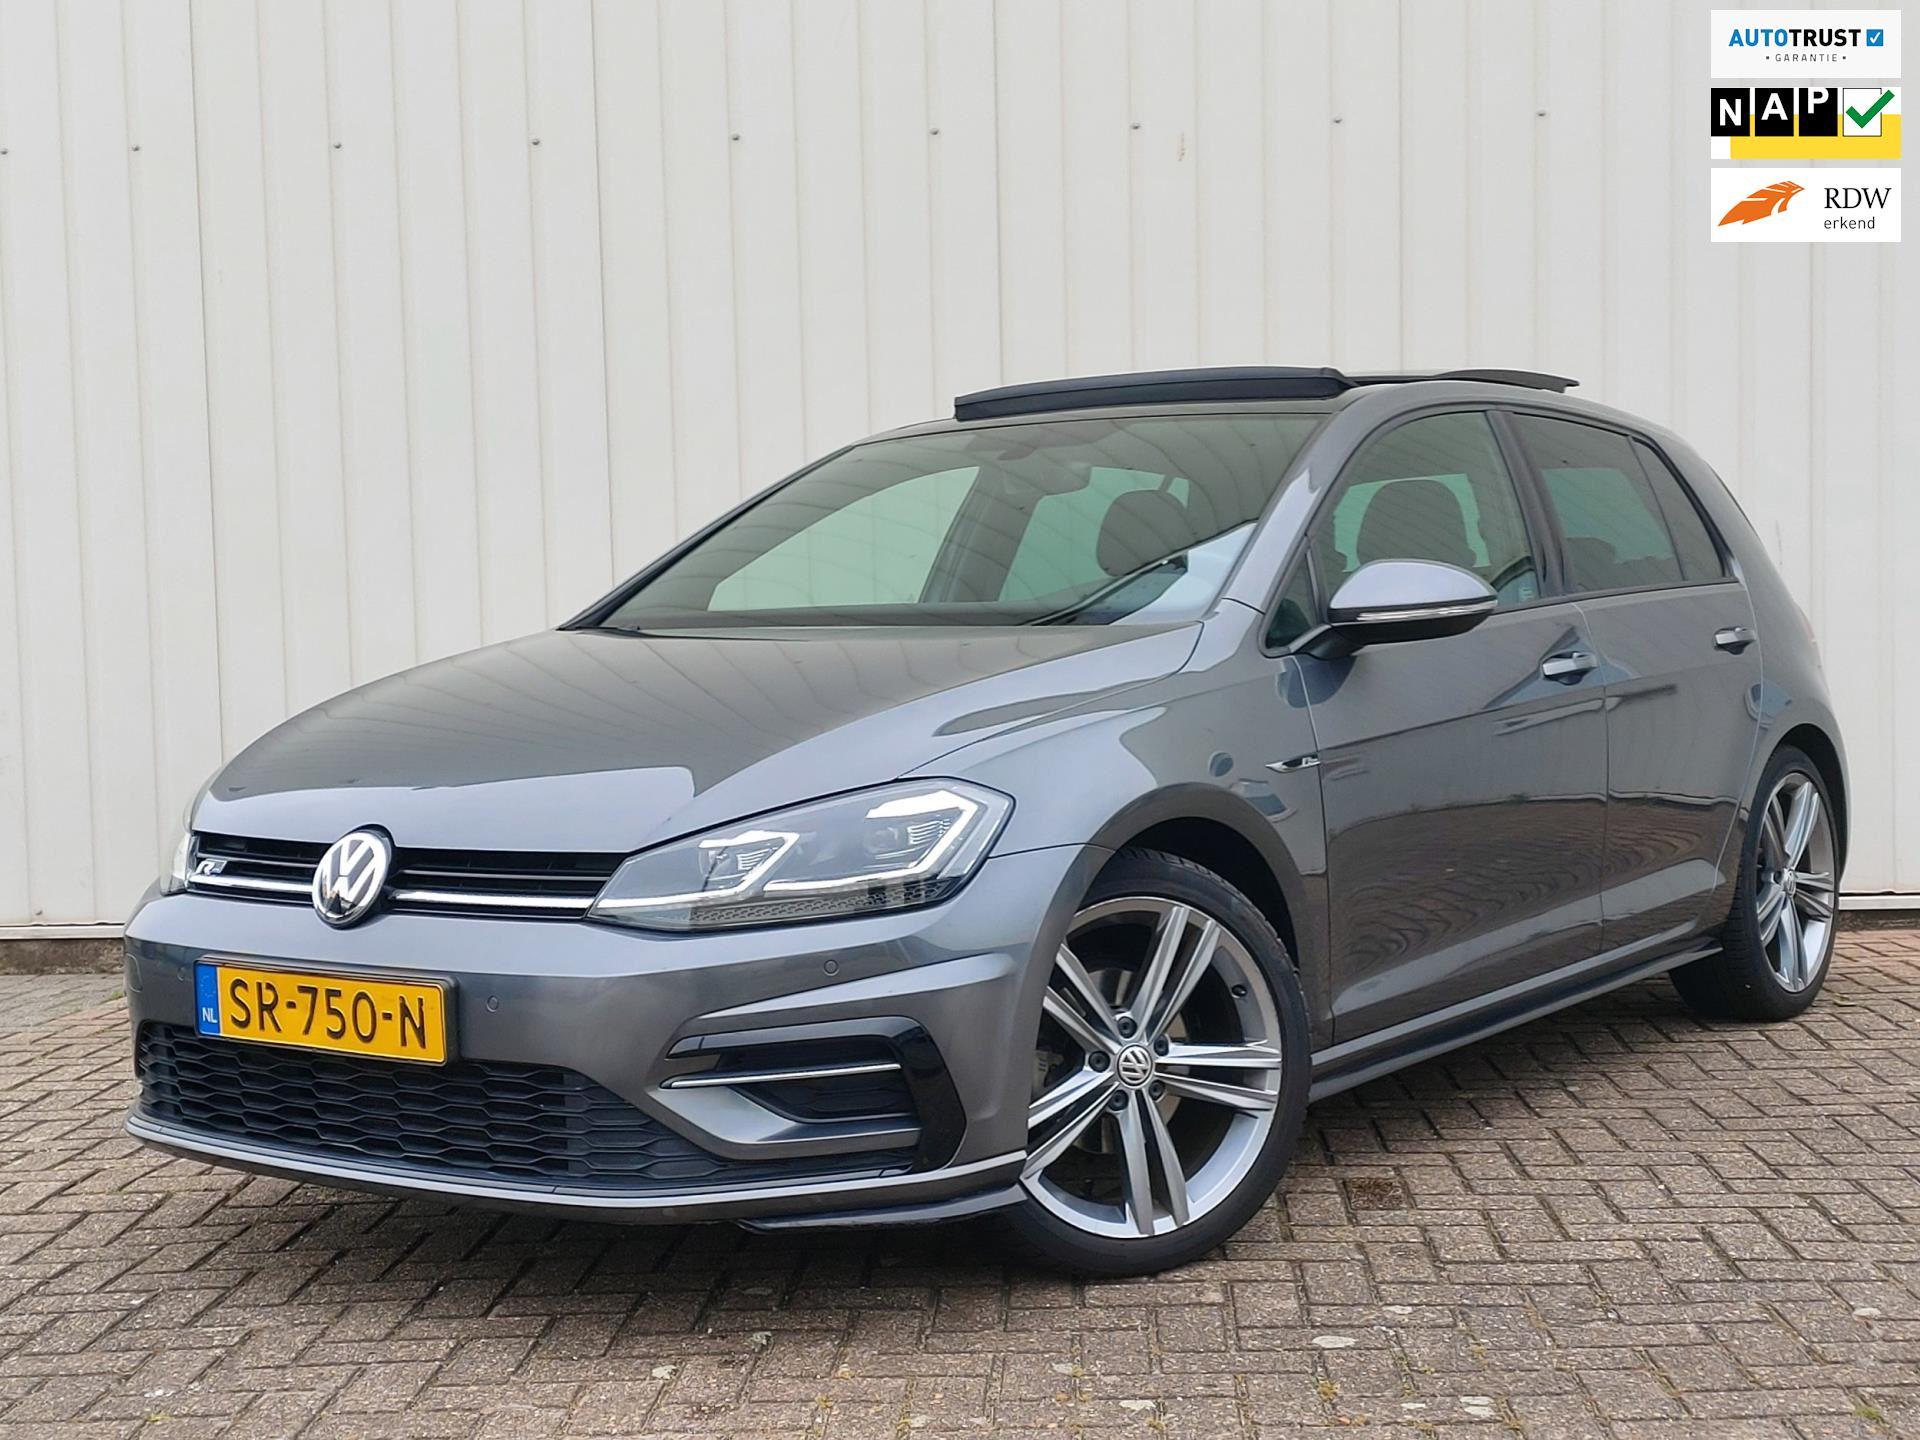 Volkswagen Golf occasion - Heel Holland Rijdt